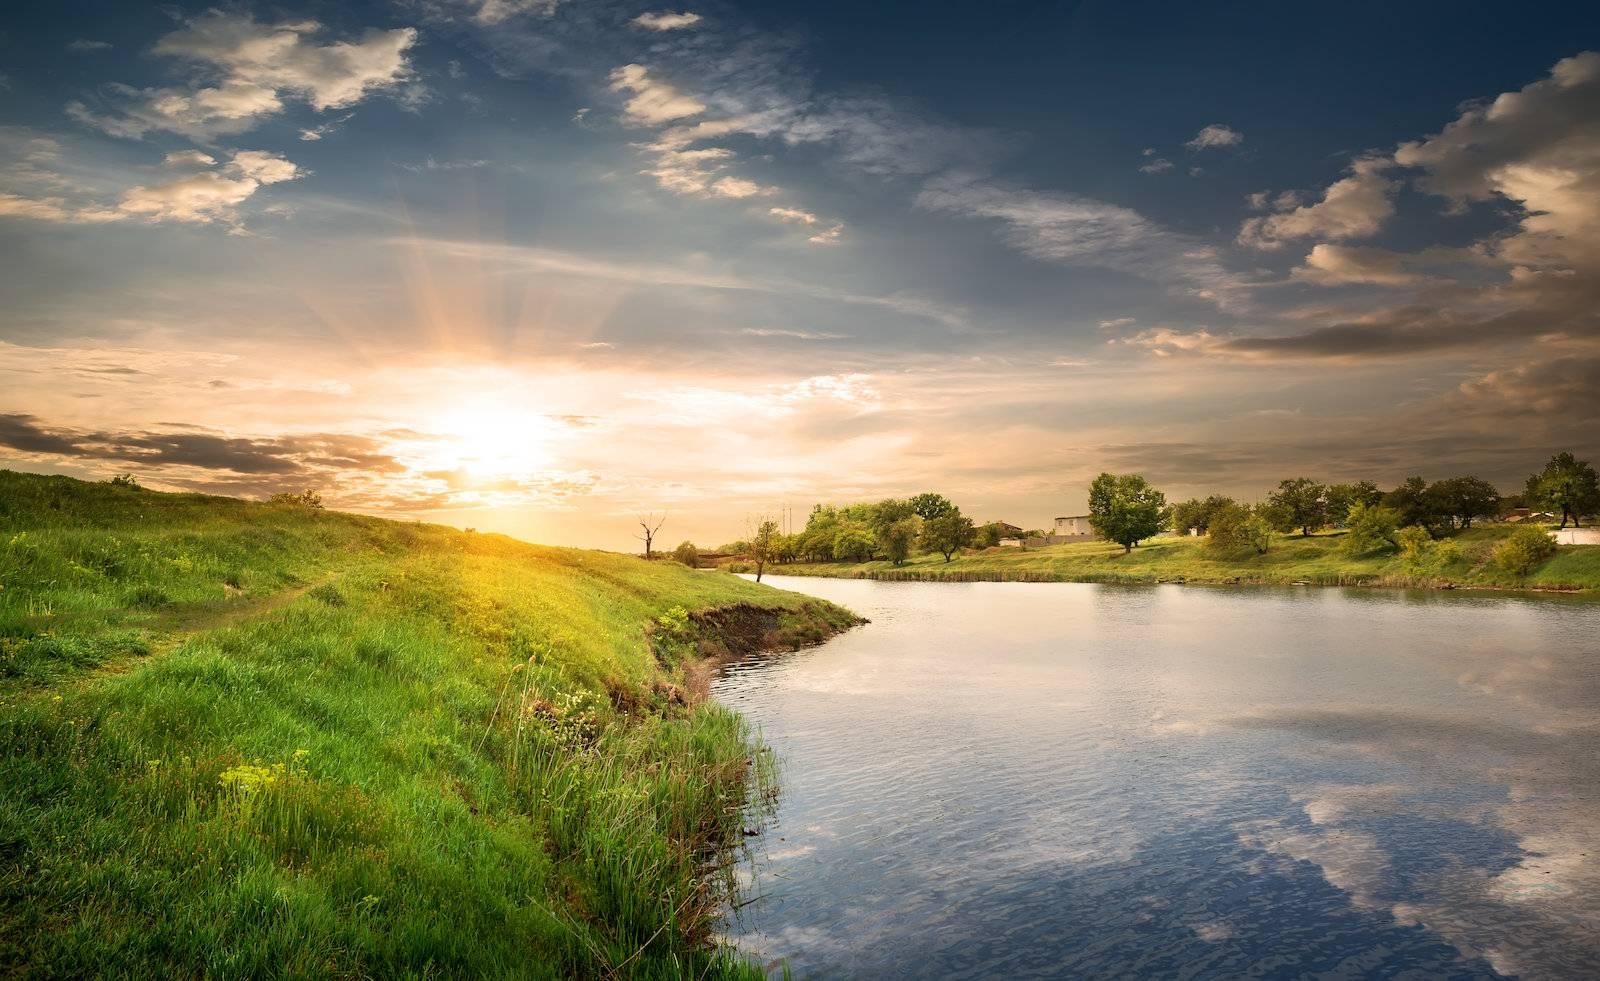 river, forest, sunlight, tree, shore, nobody - D14336576